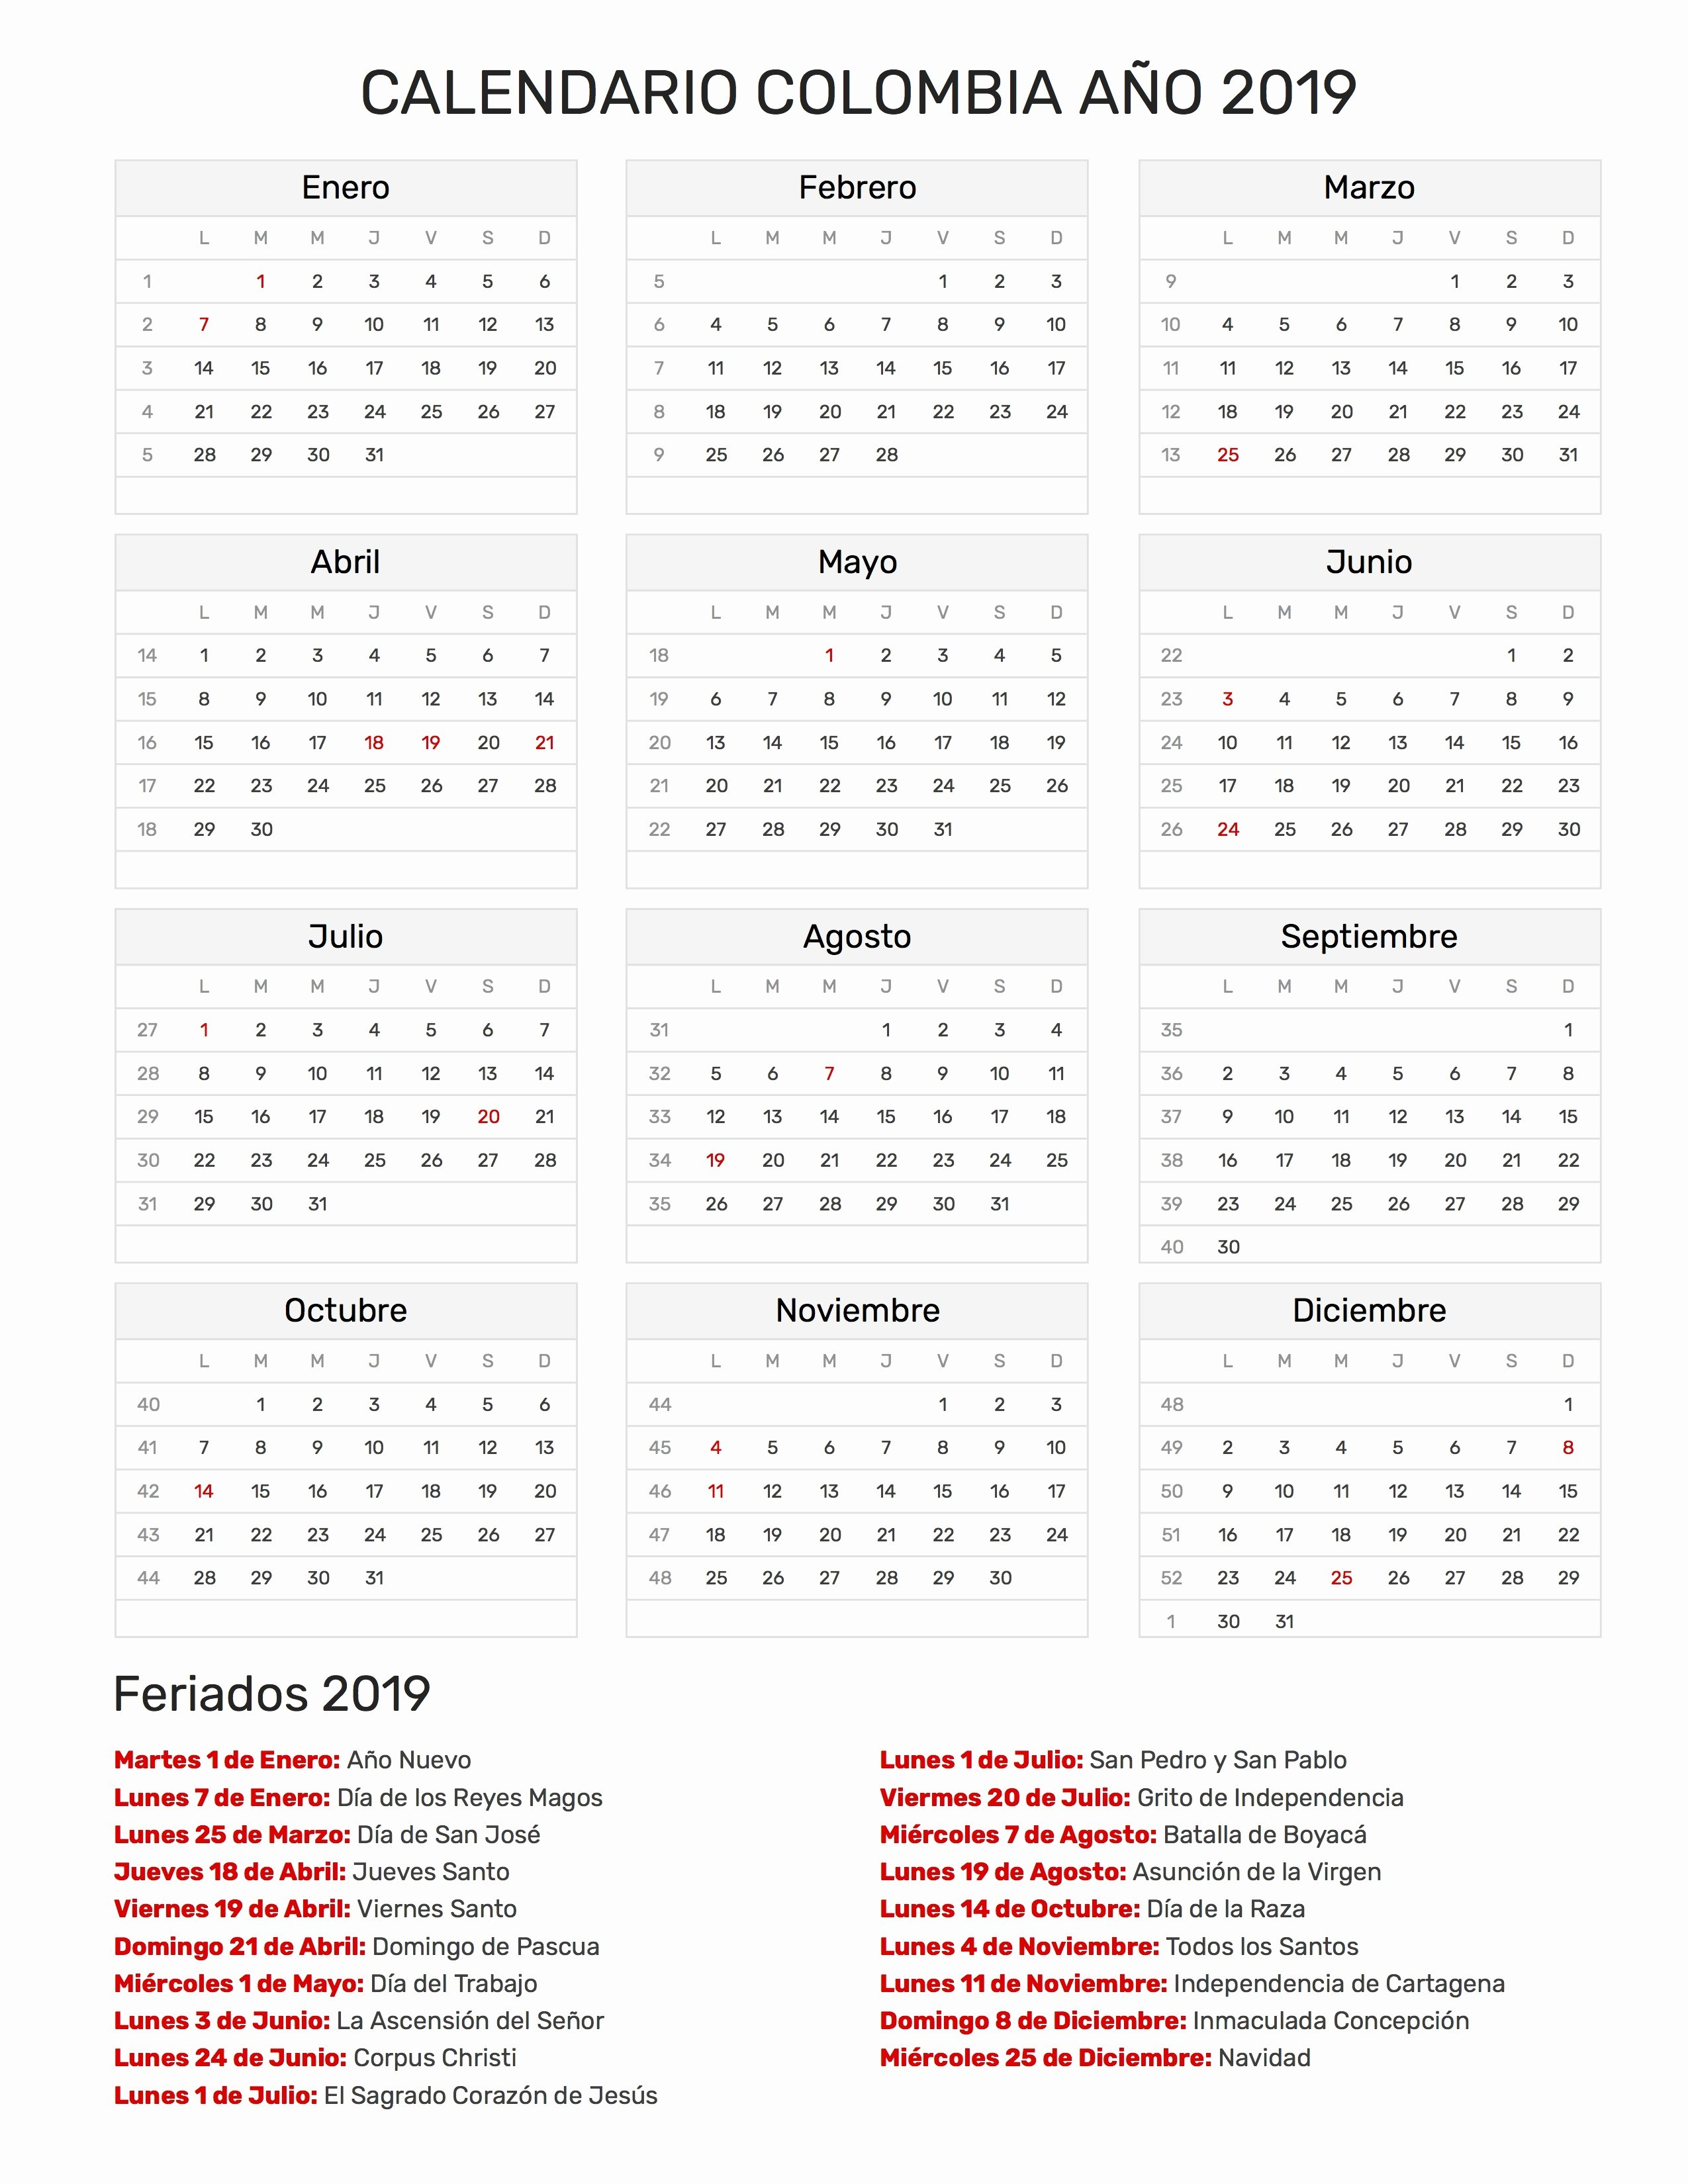 Calendario 2019 Colombia Almanaque 2019 Argentina Actual Noticias Calendario Laboral 2019 Carnaval Of Calendario 2019 Colombia Almanaque 2019 Argentina Mejores Y Más Novedosos Quito 16 Diciembre 2015 [pdf Document]